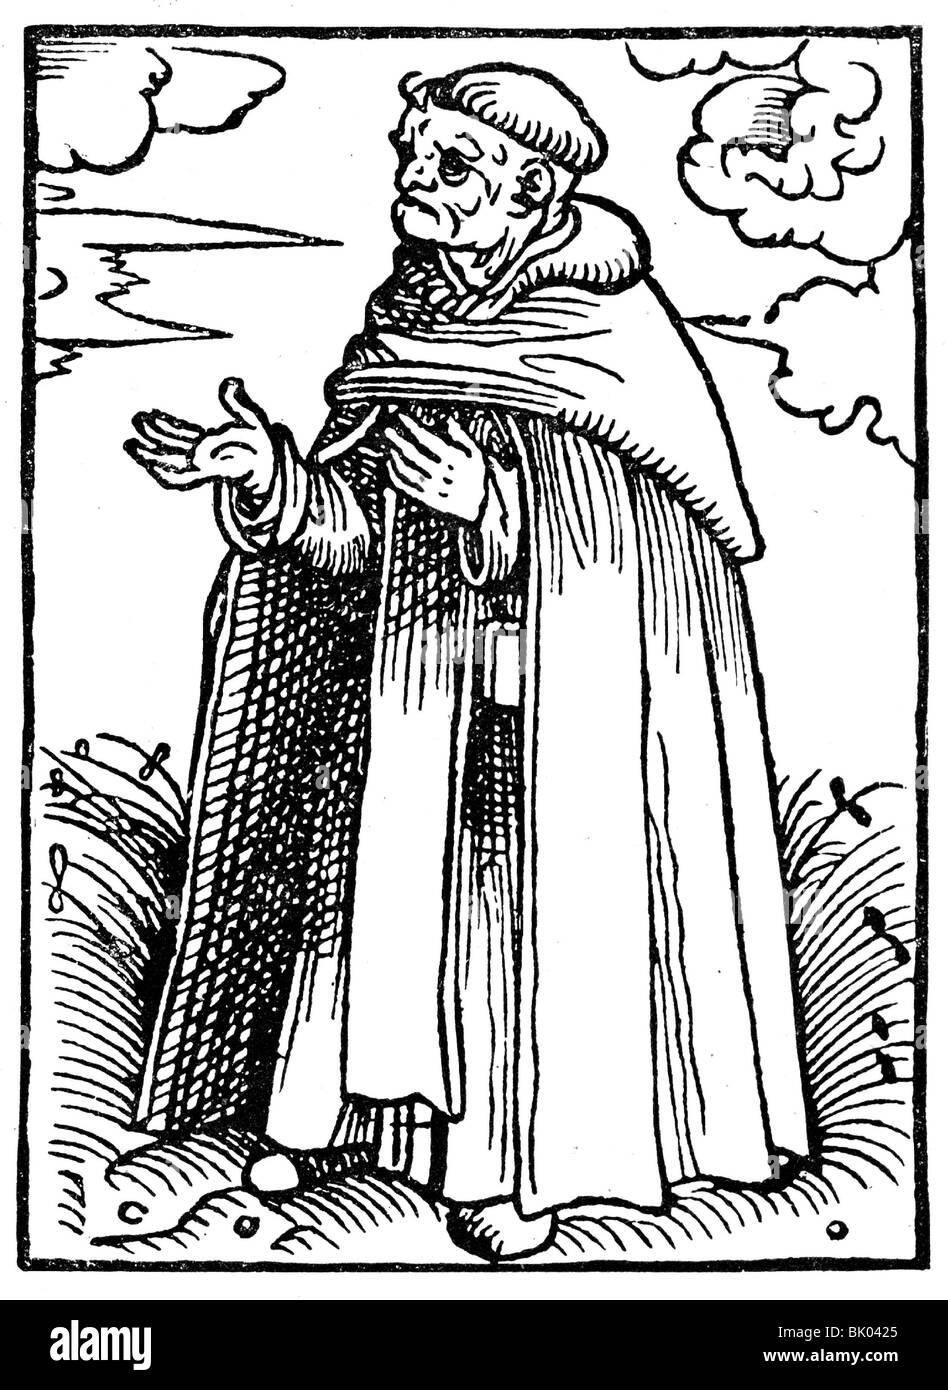 religion, religious orders, Dominican Order (Order of Preachers, Ordo de Praedicatorum), monk in habit, illustration Stock Photo